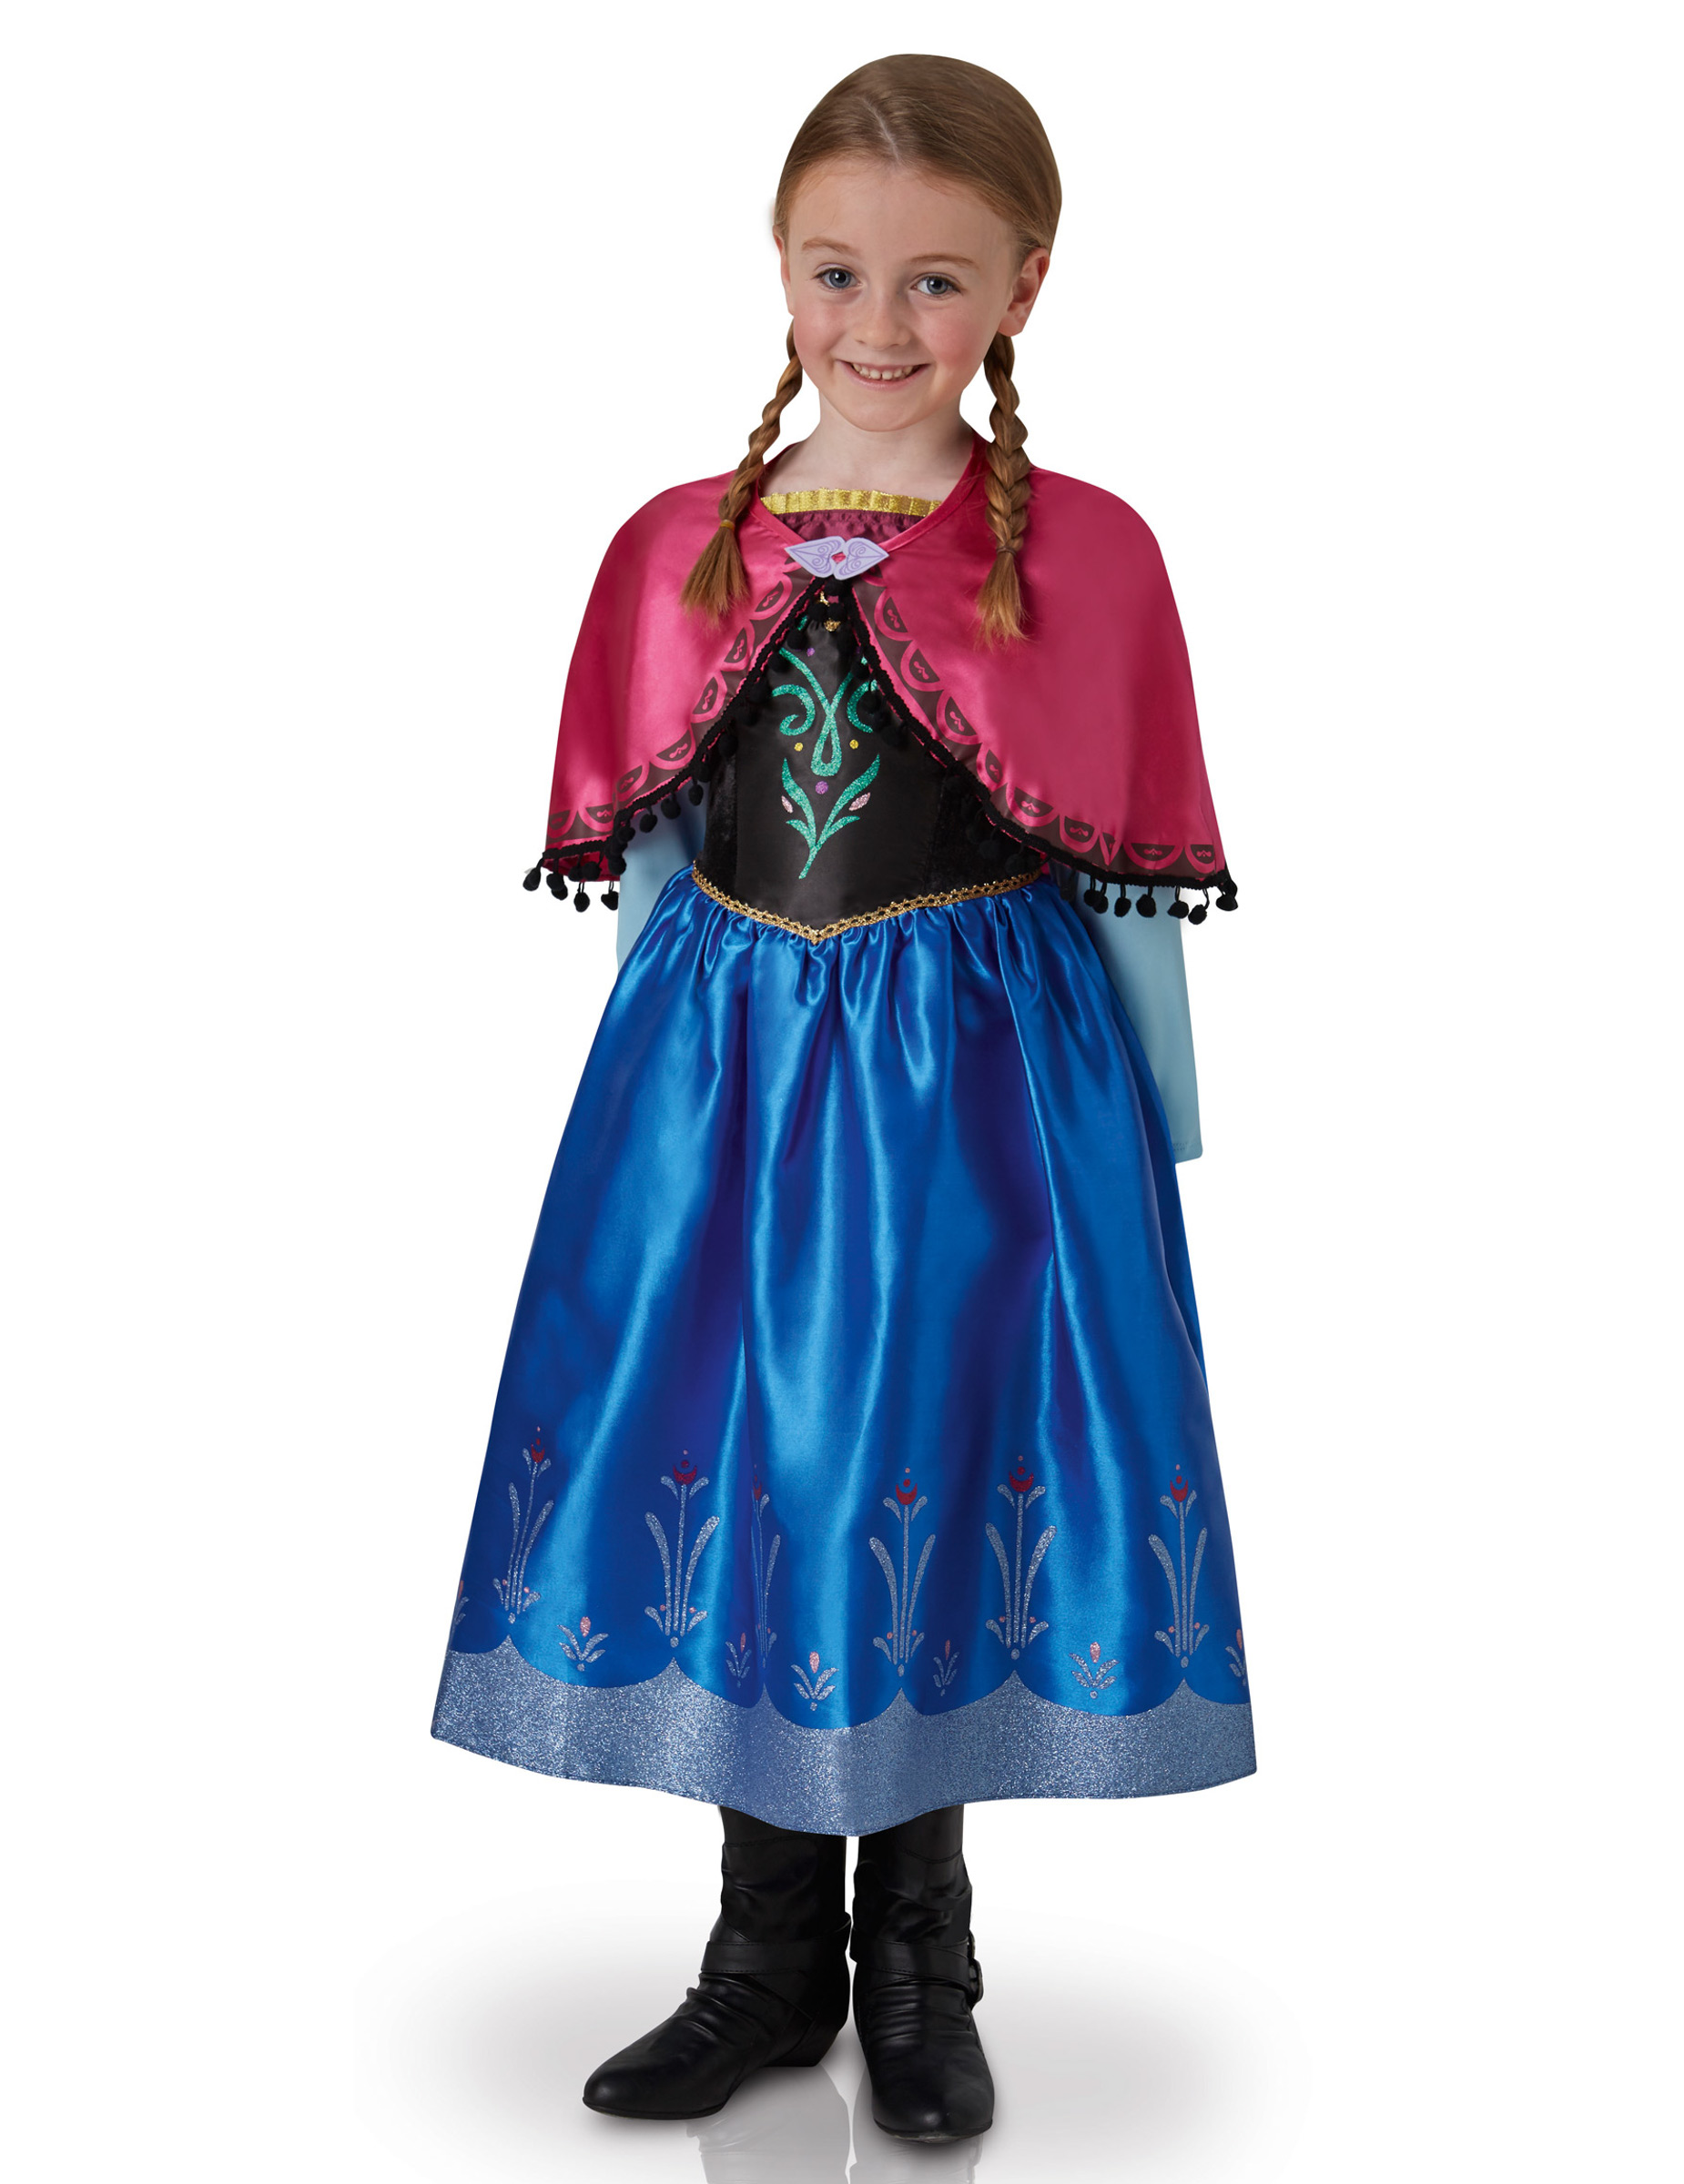 867d3073a780 Costumi di Carnevale Frozen™ a prezzi bassissimi su Vegaoo.it